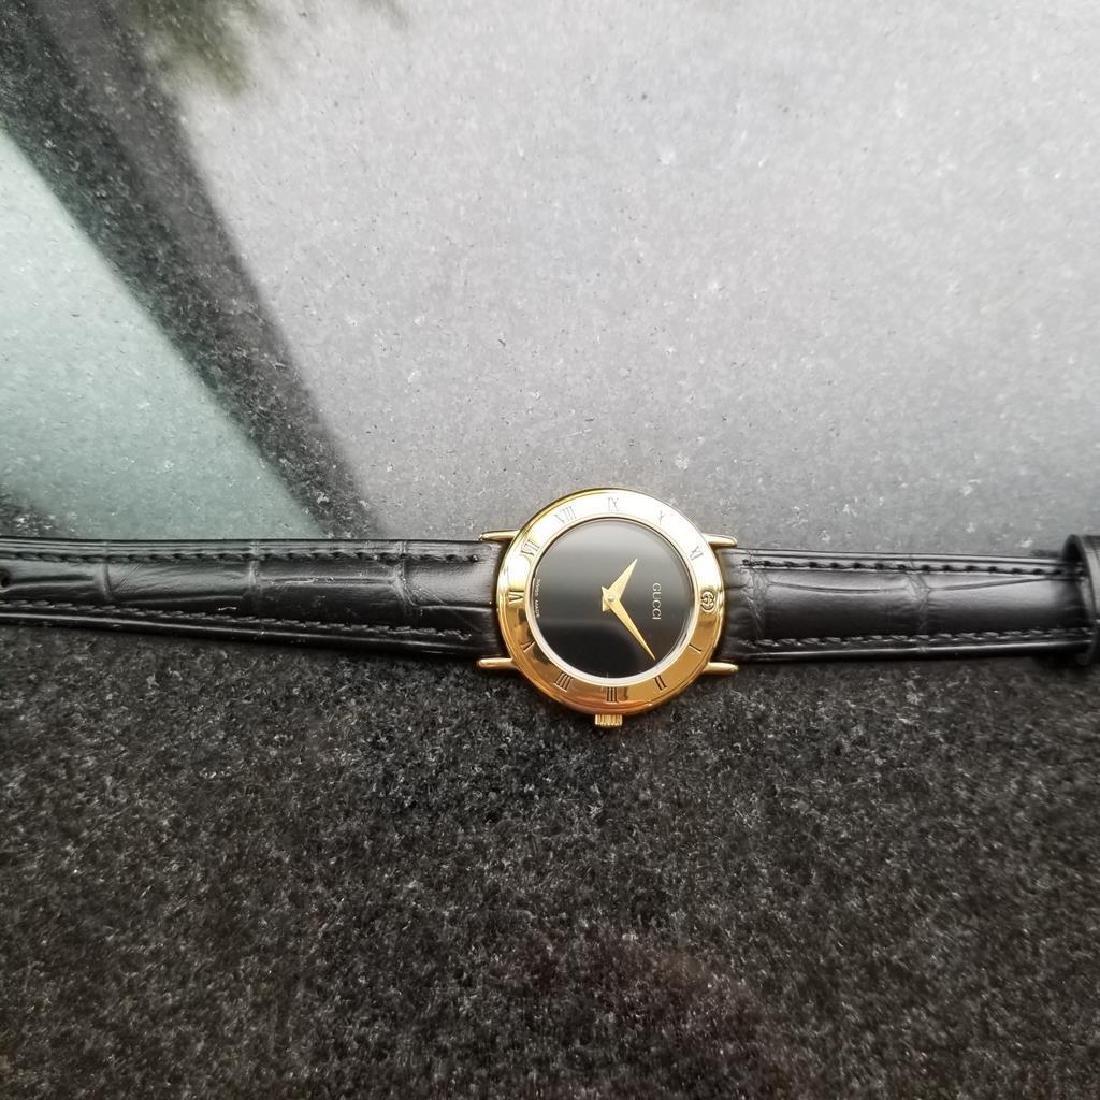 GUCCI Ladies Gold-Plated 3000.2.L Lux Swiss Dress Watch - 8